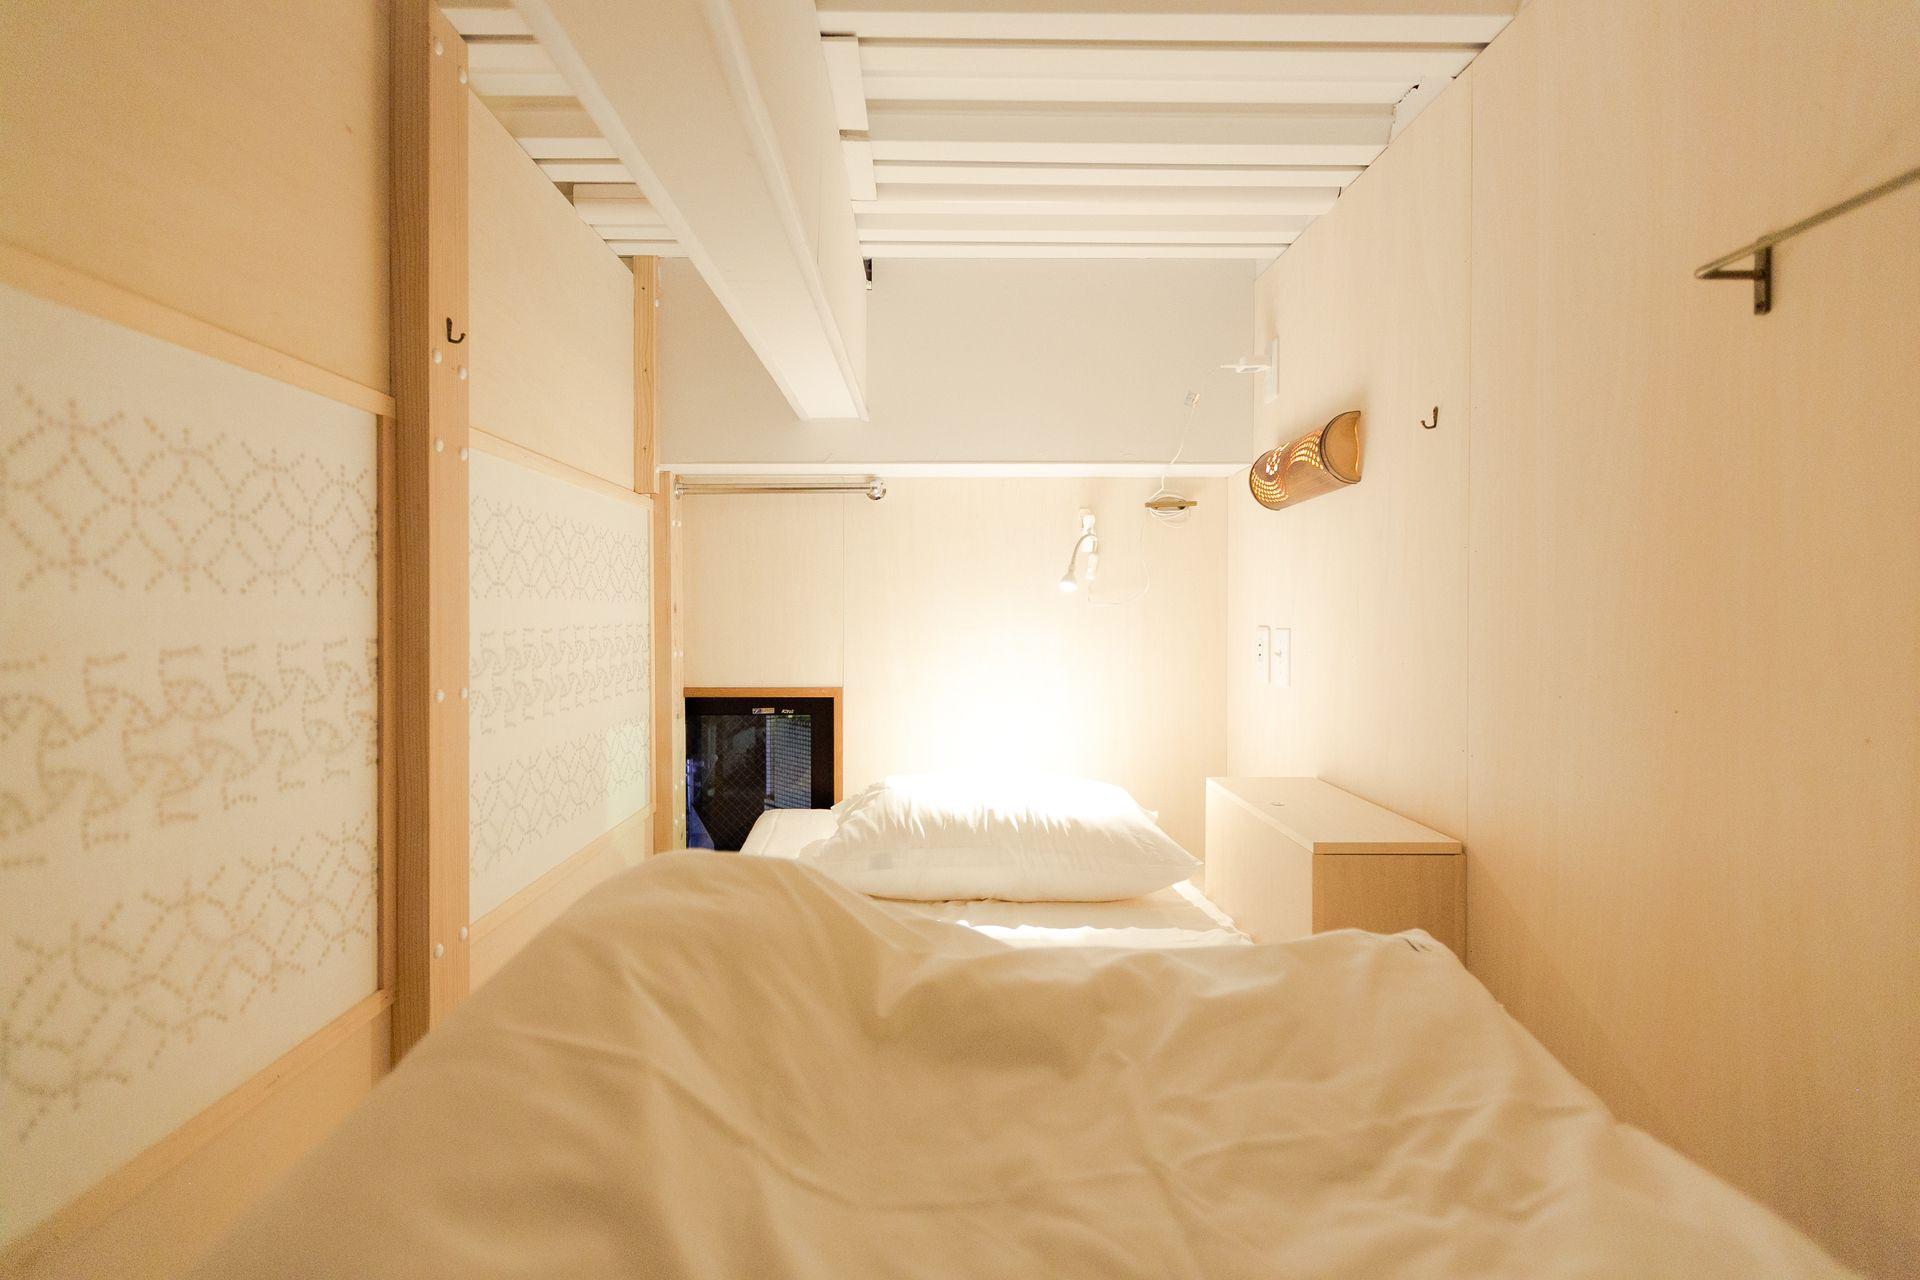 Hakata Minoshima Hostel FUTAGI, 福岡市, 6人用ドミトリー 【女性専用】, 客室